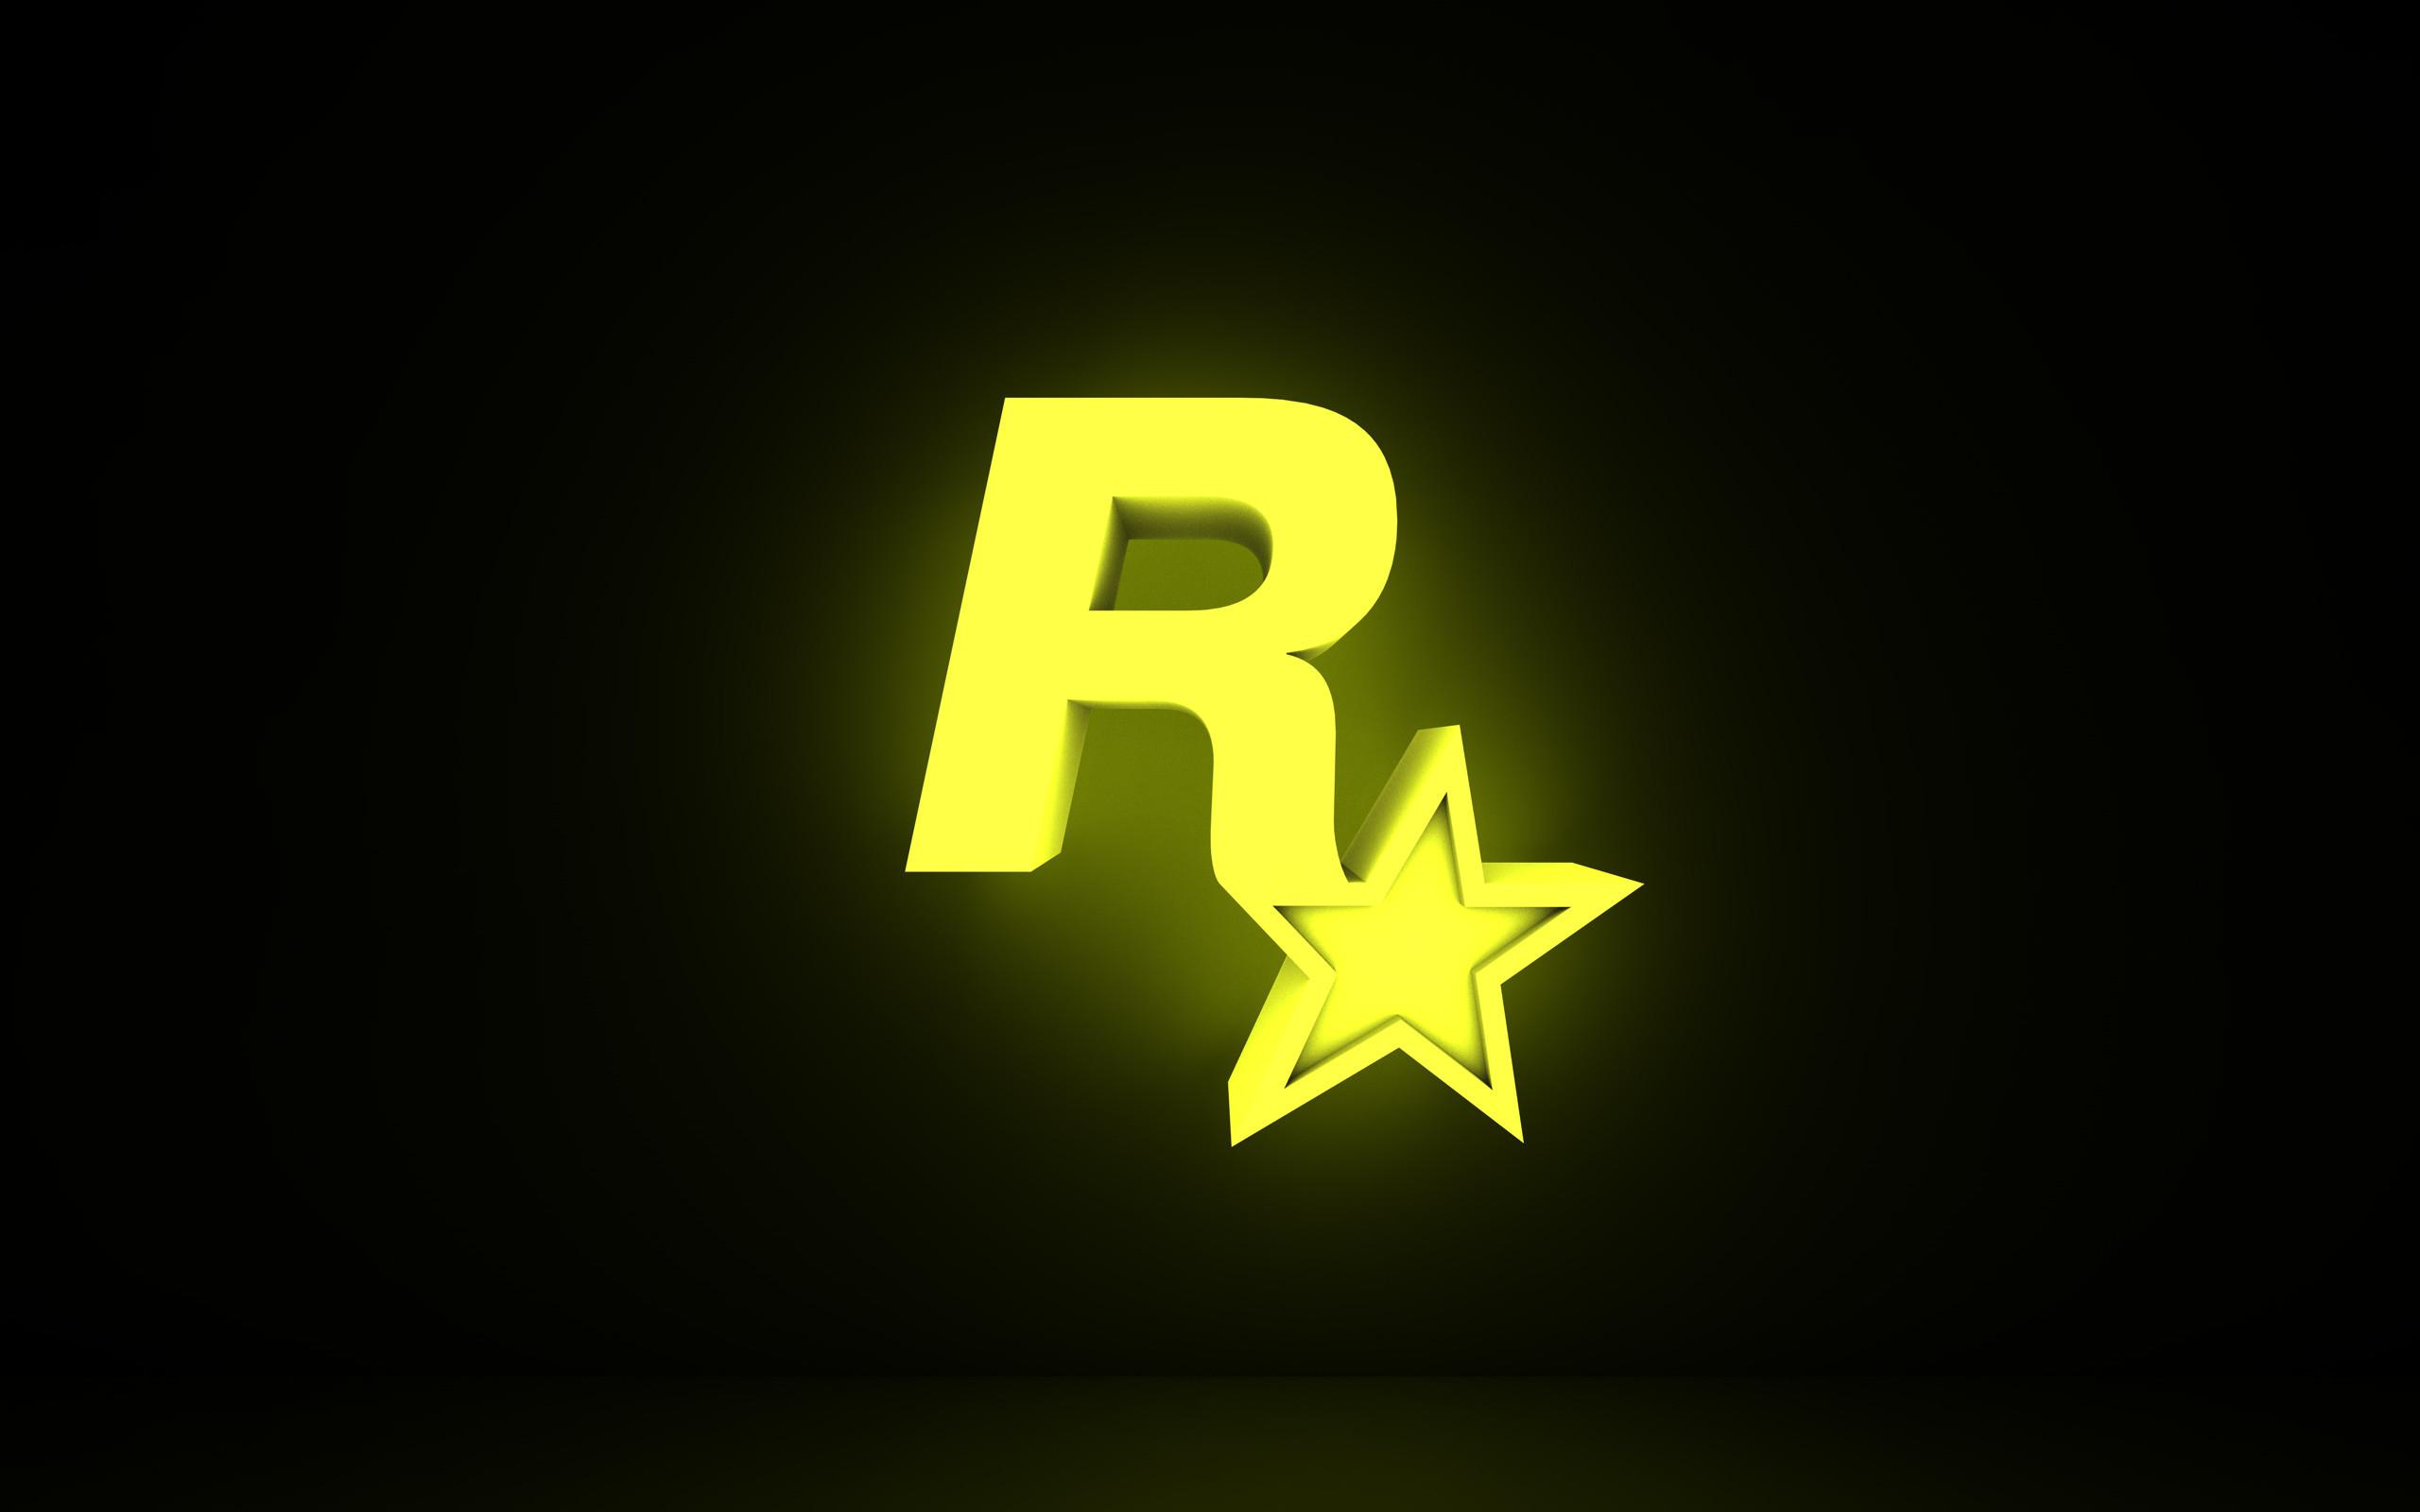 Rockstar Energy Drink Wallpaper Free Hd Wallpaper 1024×768 Rockstar Logo  Wallpapers (44 Wallpapers) | Adorable Wallpapers | Wallpapers | Pinterest |  …